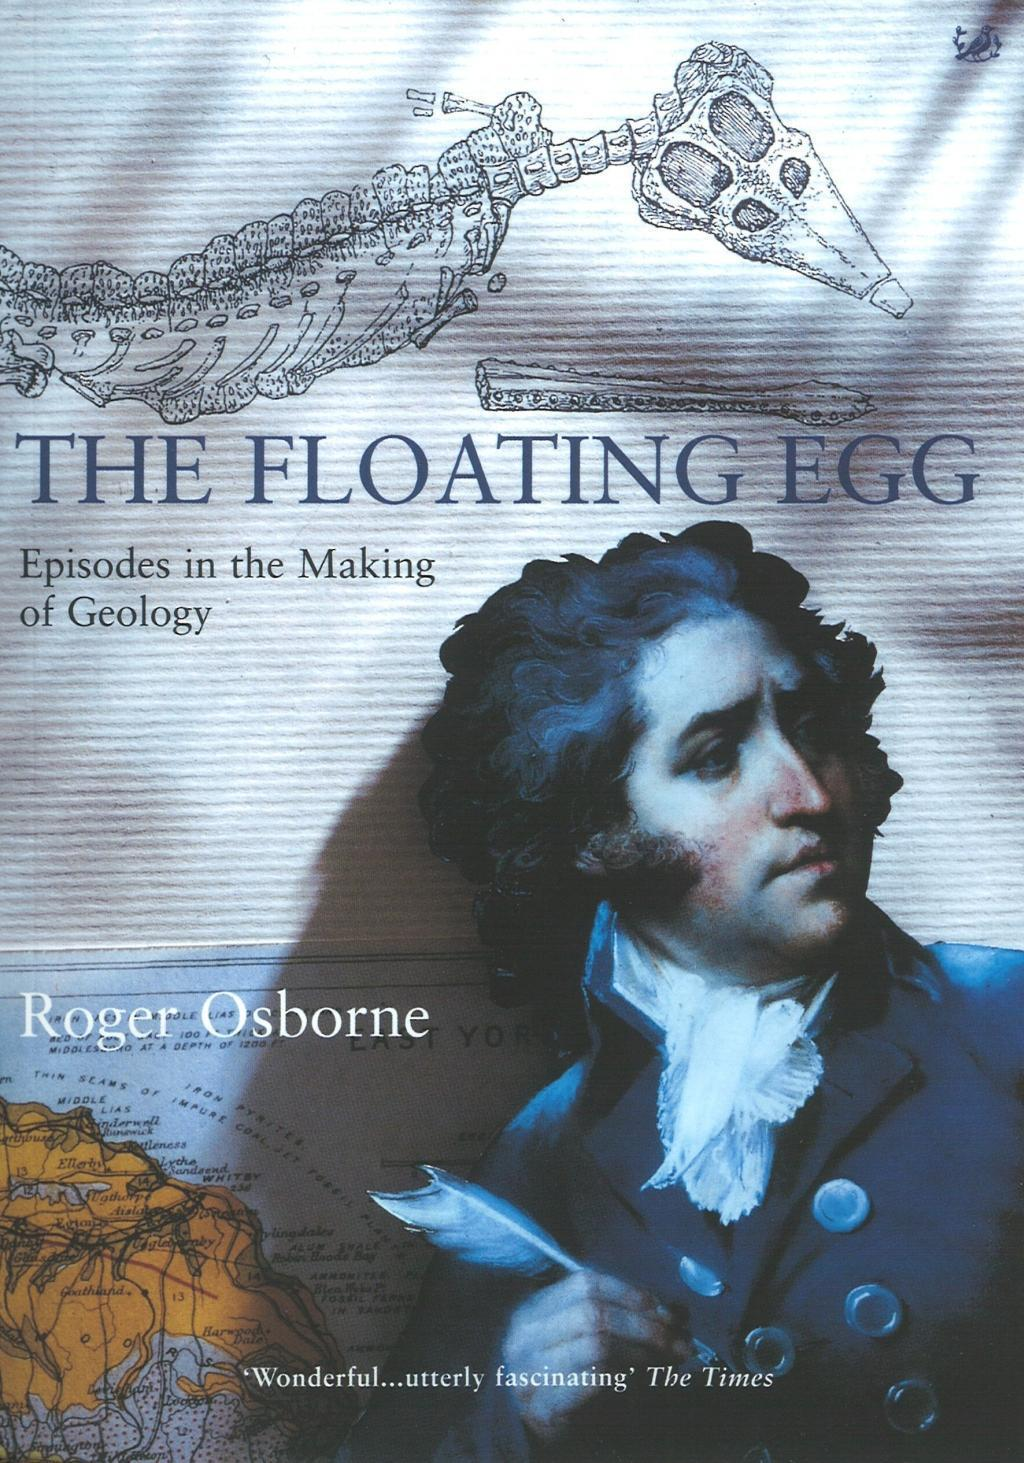 The Floating Egg